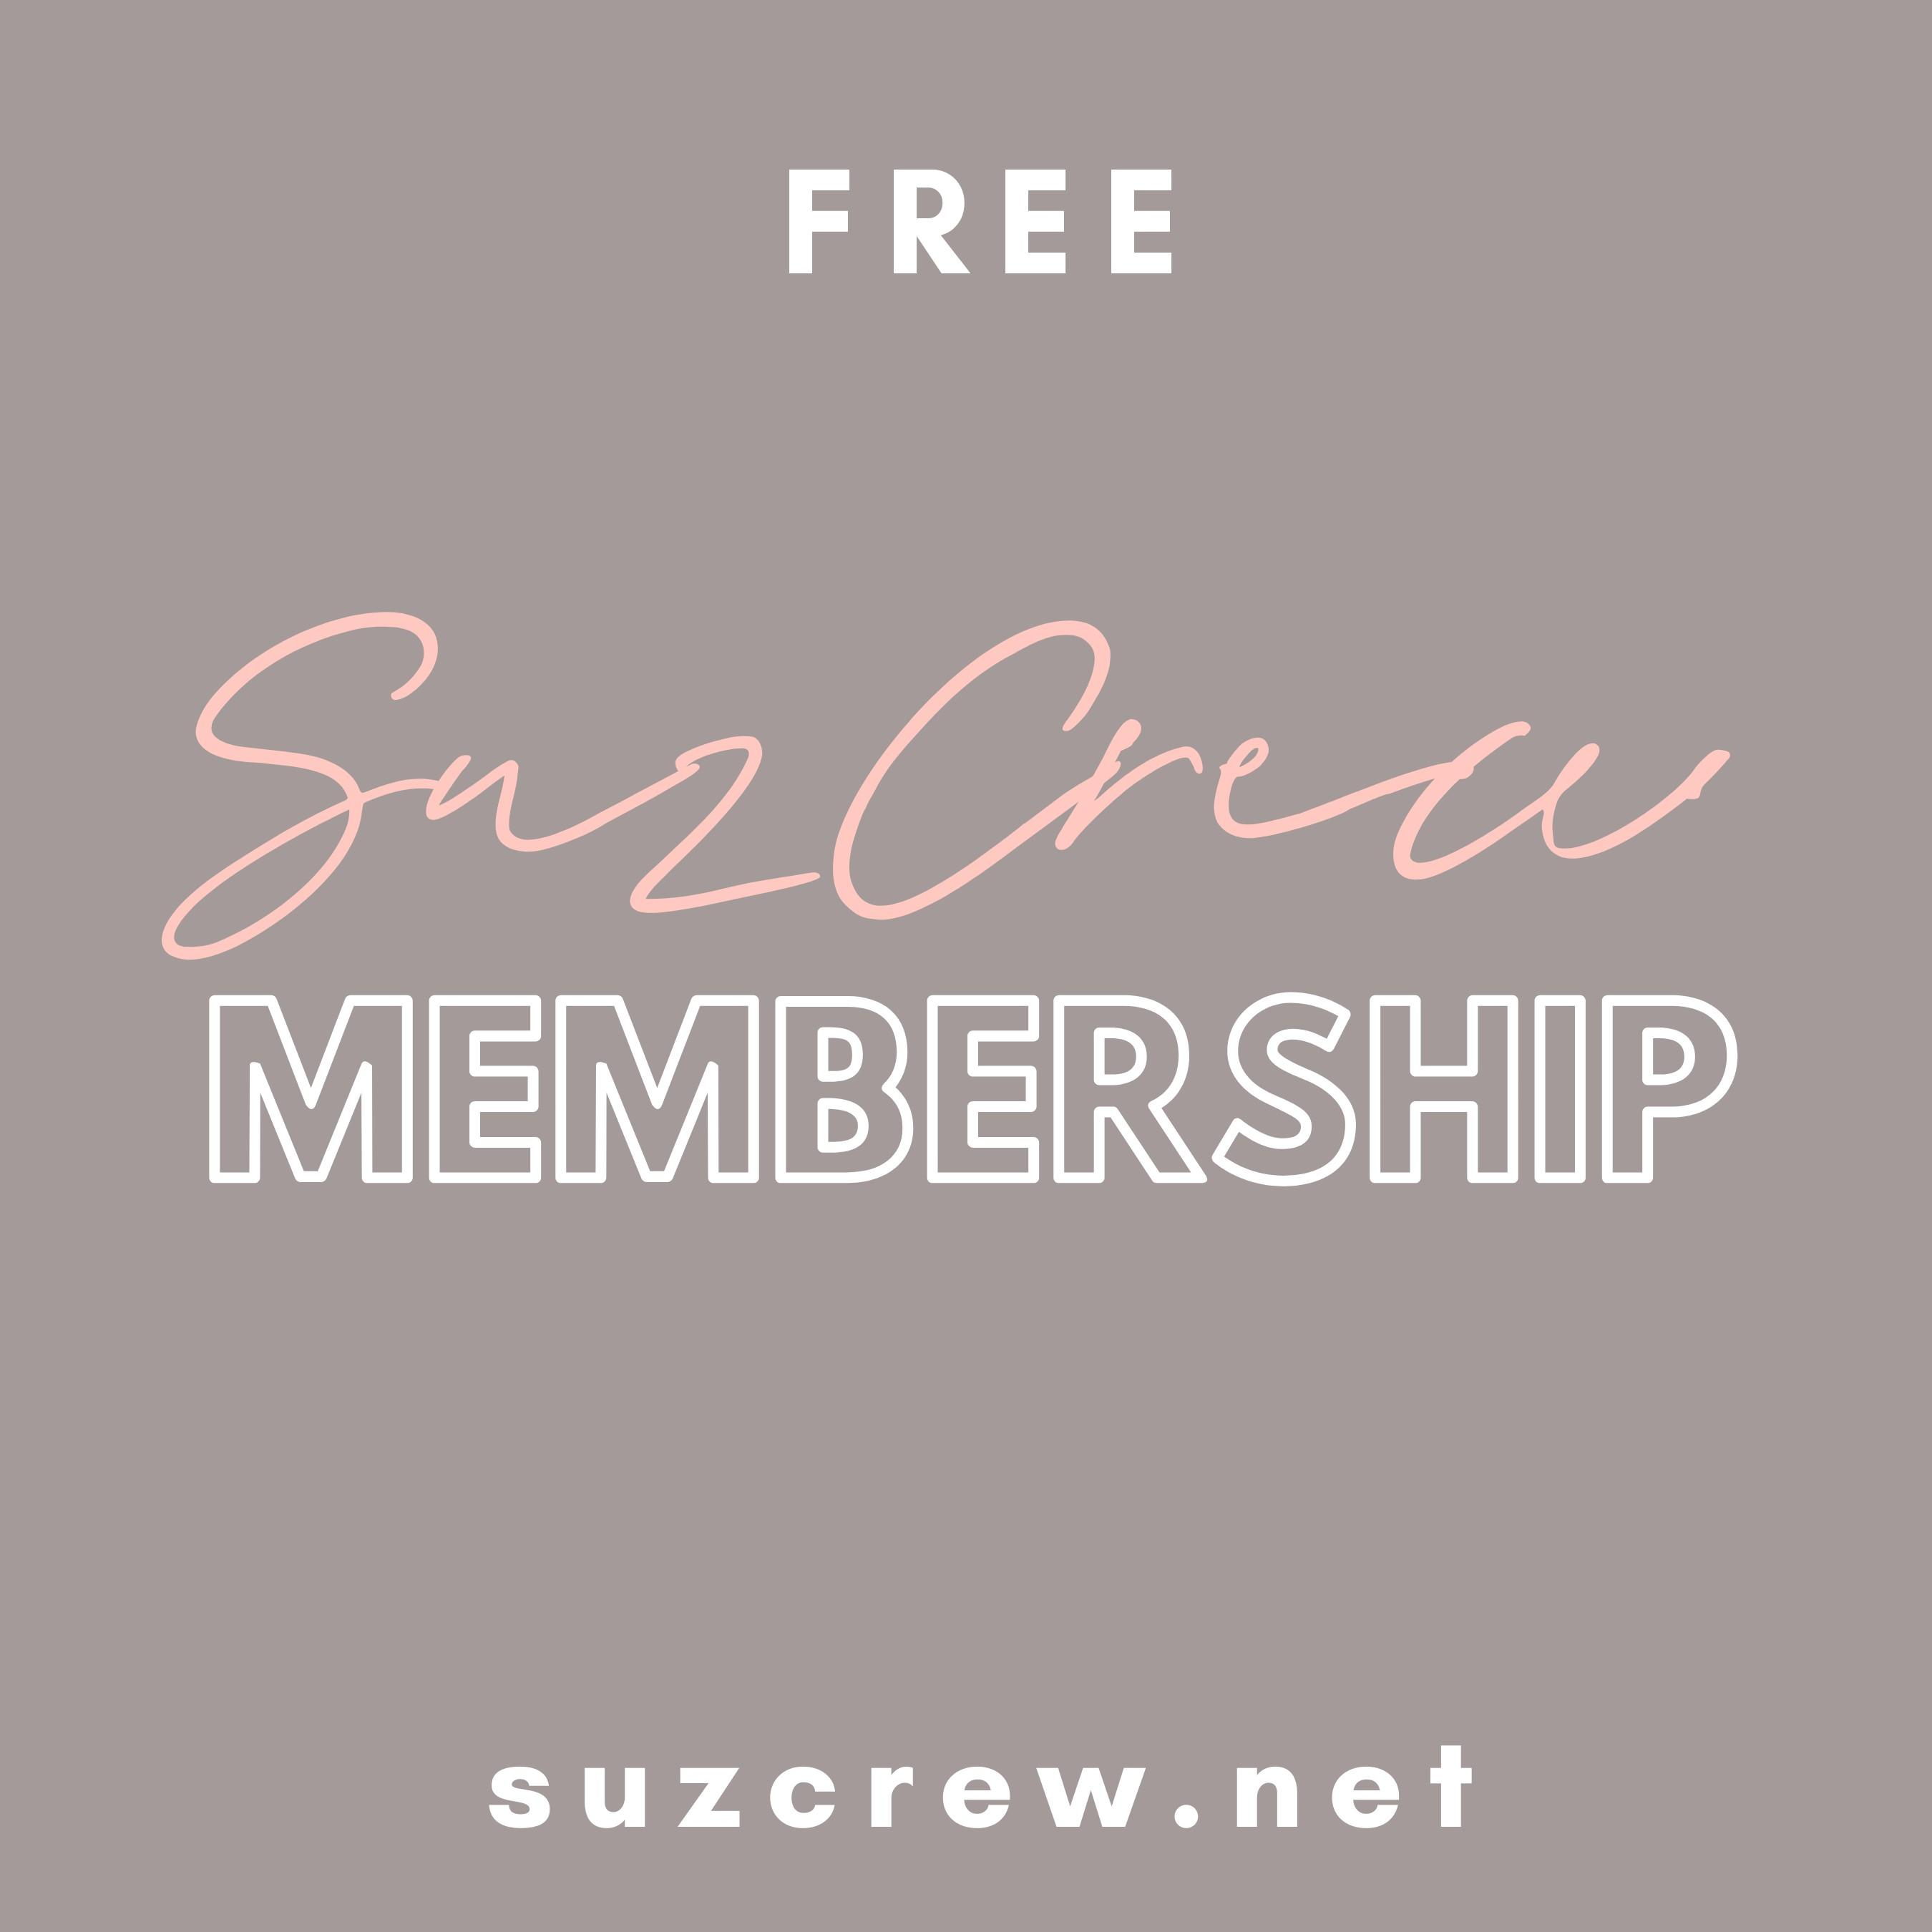 suzcrew membership